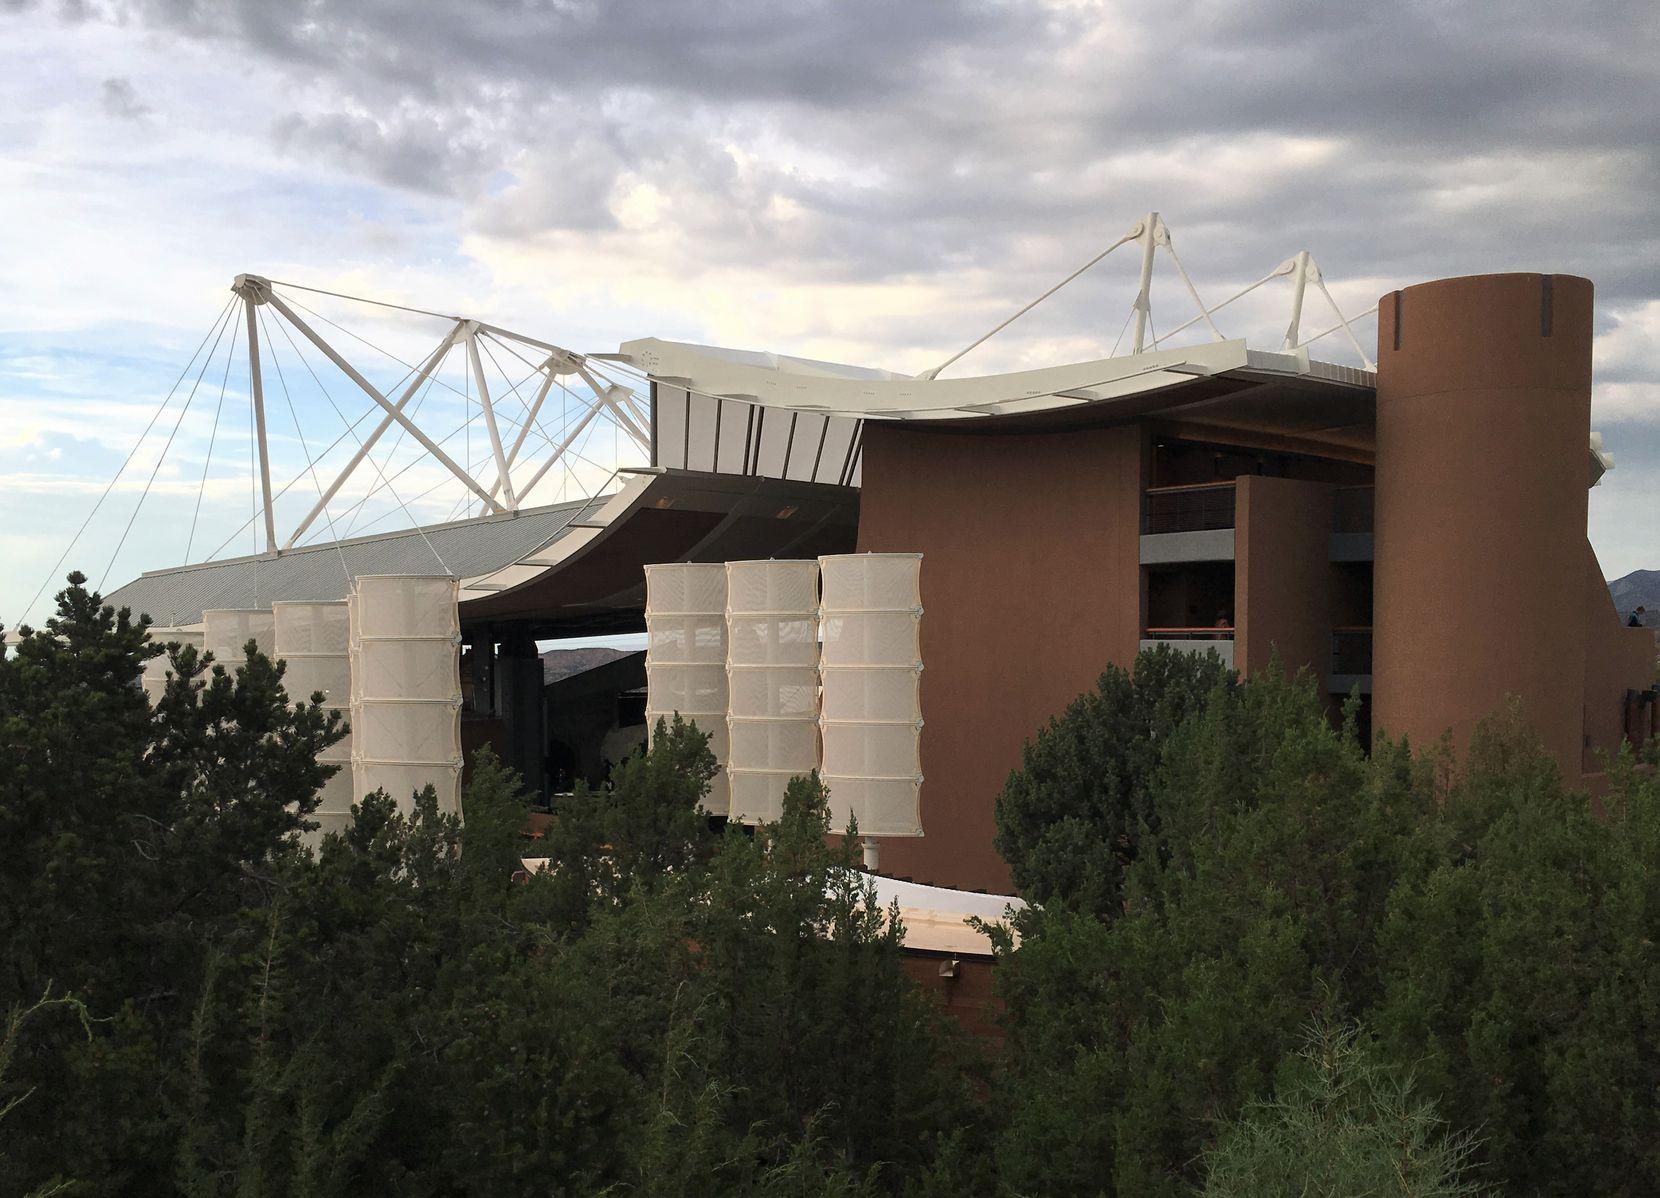 Santa Fe Opera's Crosby Theatre hosts the performances.